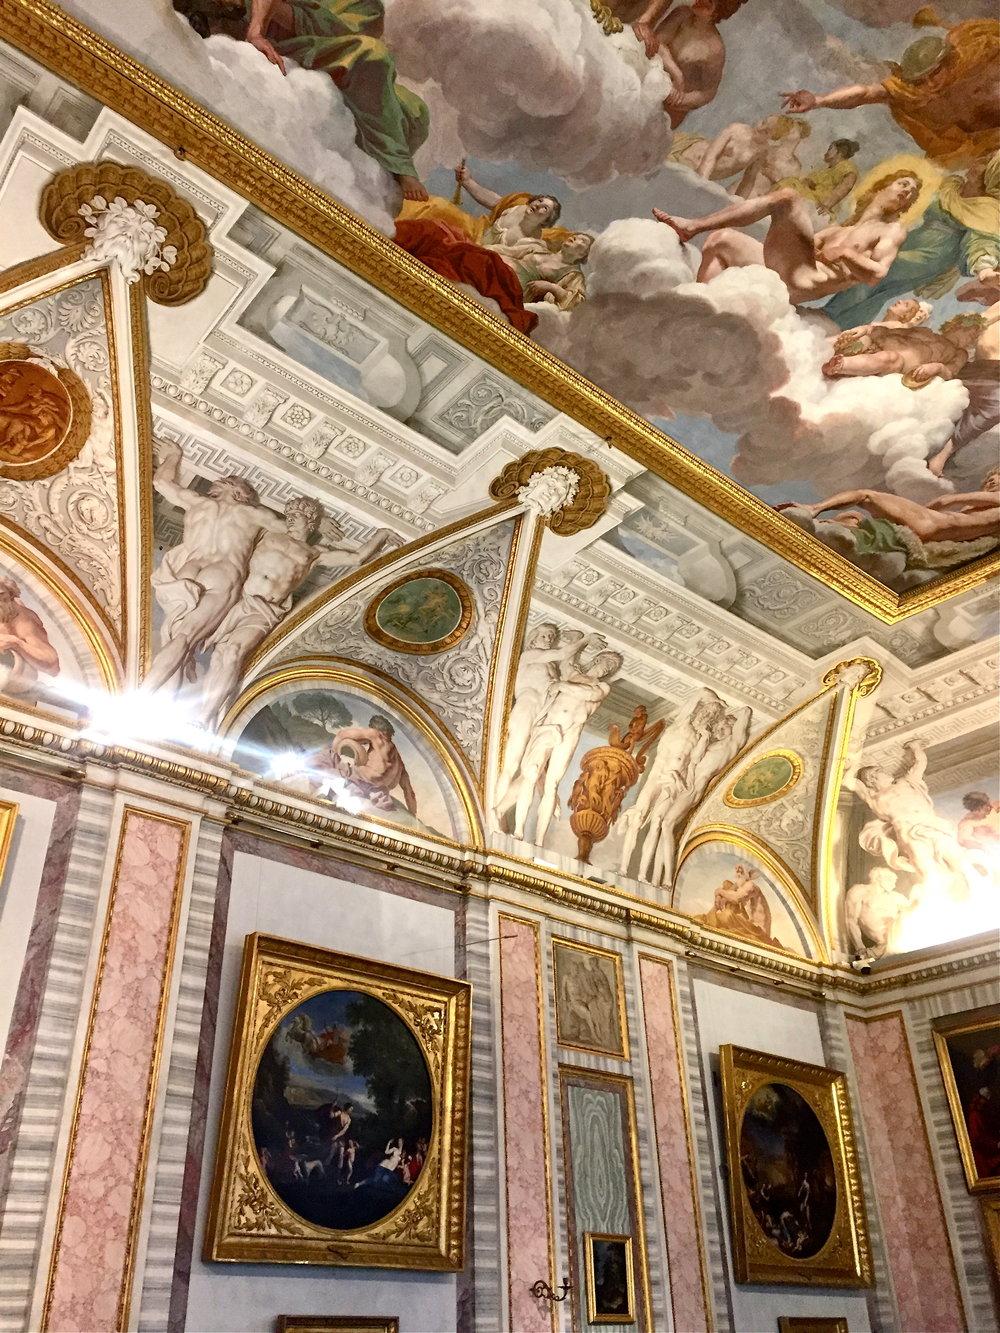 Galleria Borghese, Rome, Italy.